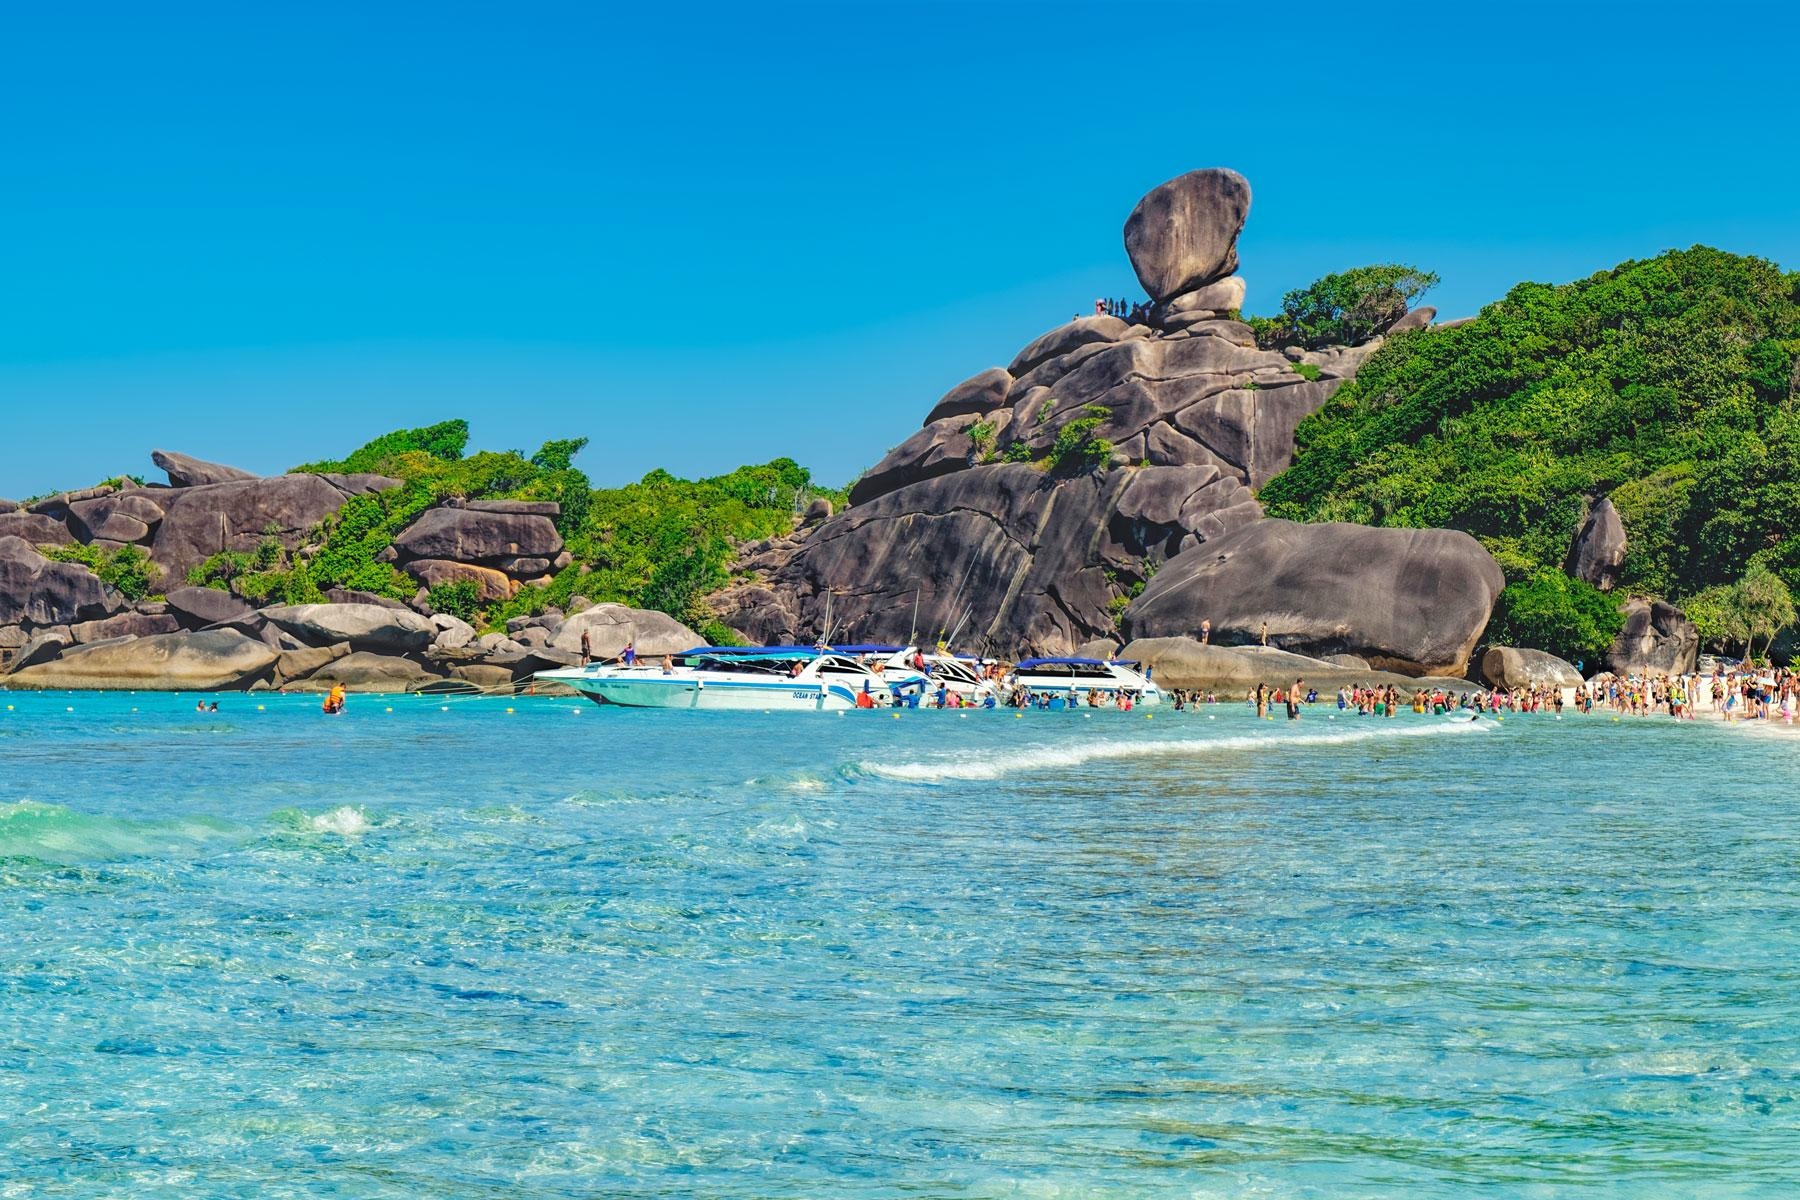 05_Thailand_Snorkeling_Diving_Koh_Similan_dreamstime_xxl_96322904